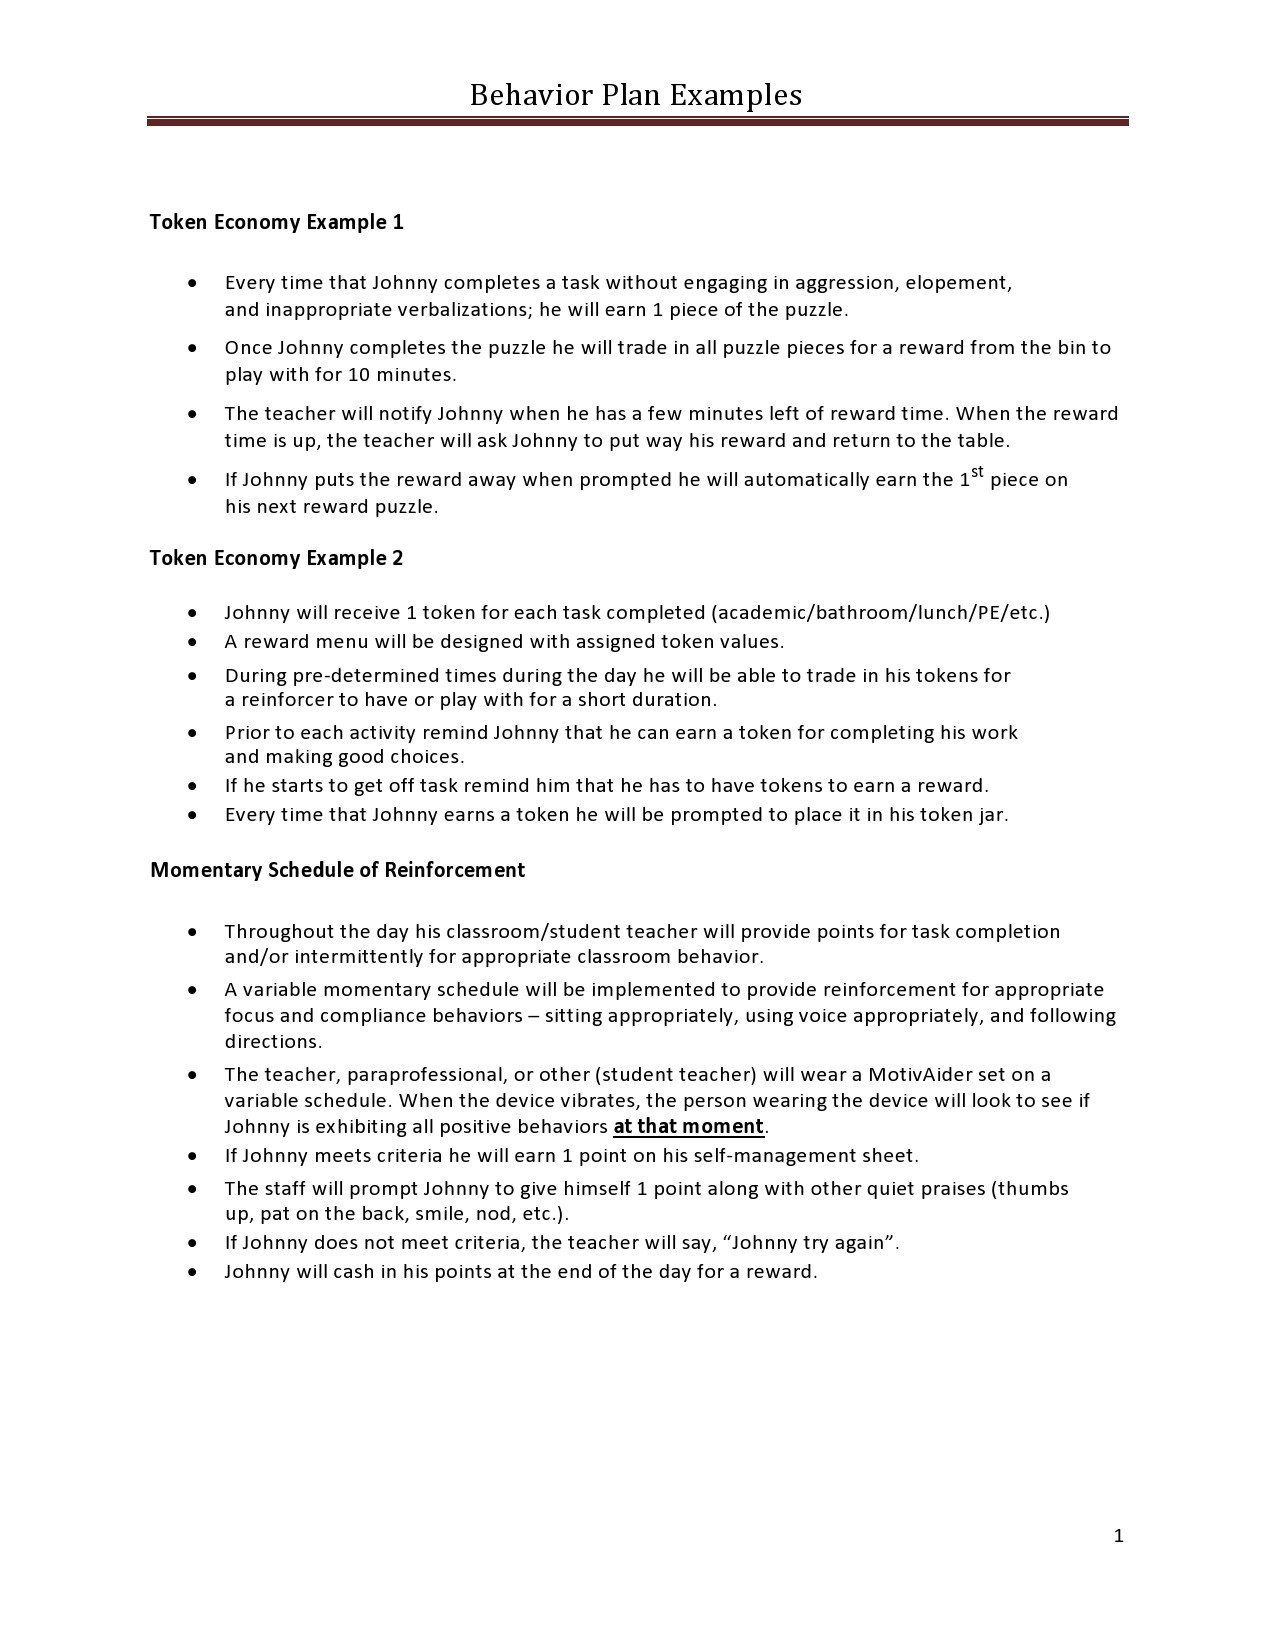 Free behavior plan template 41